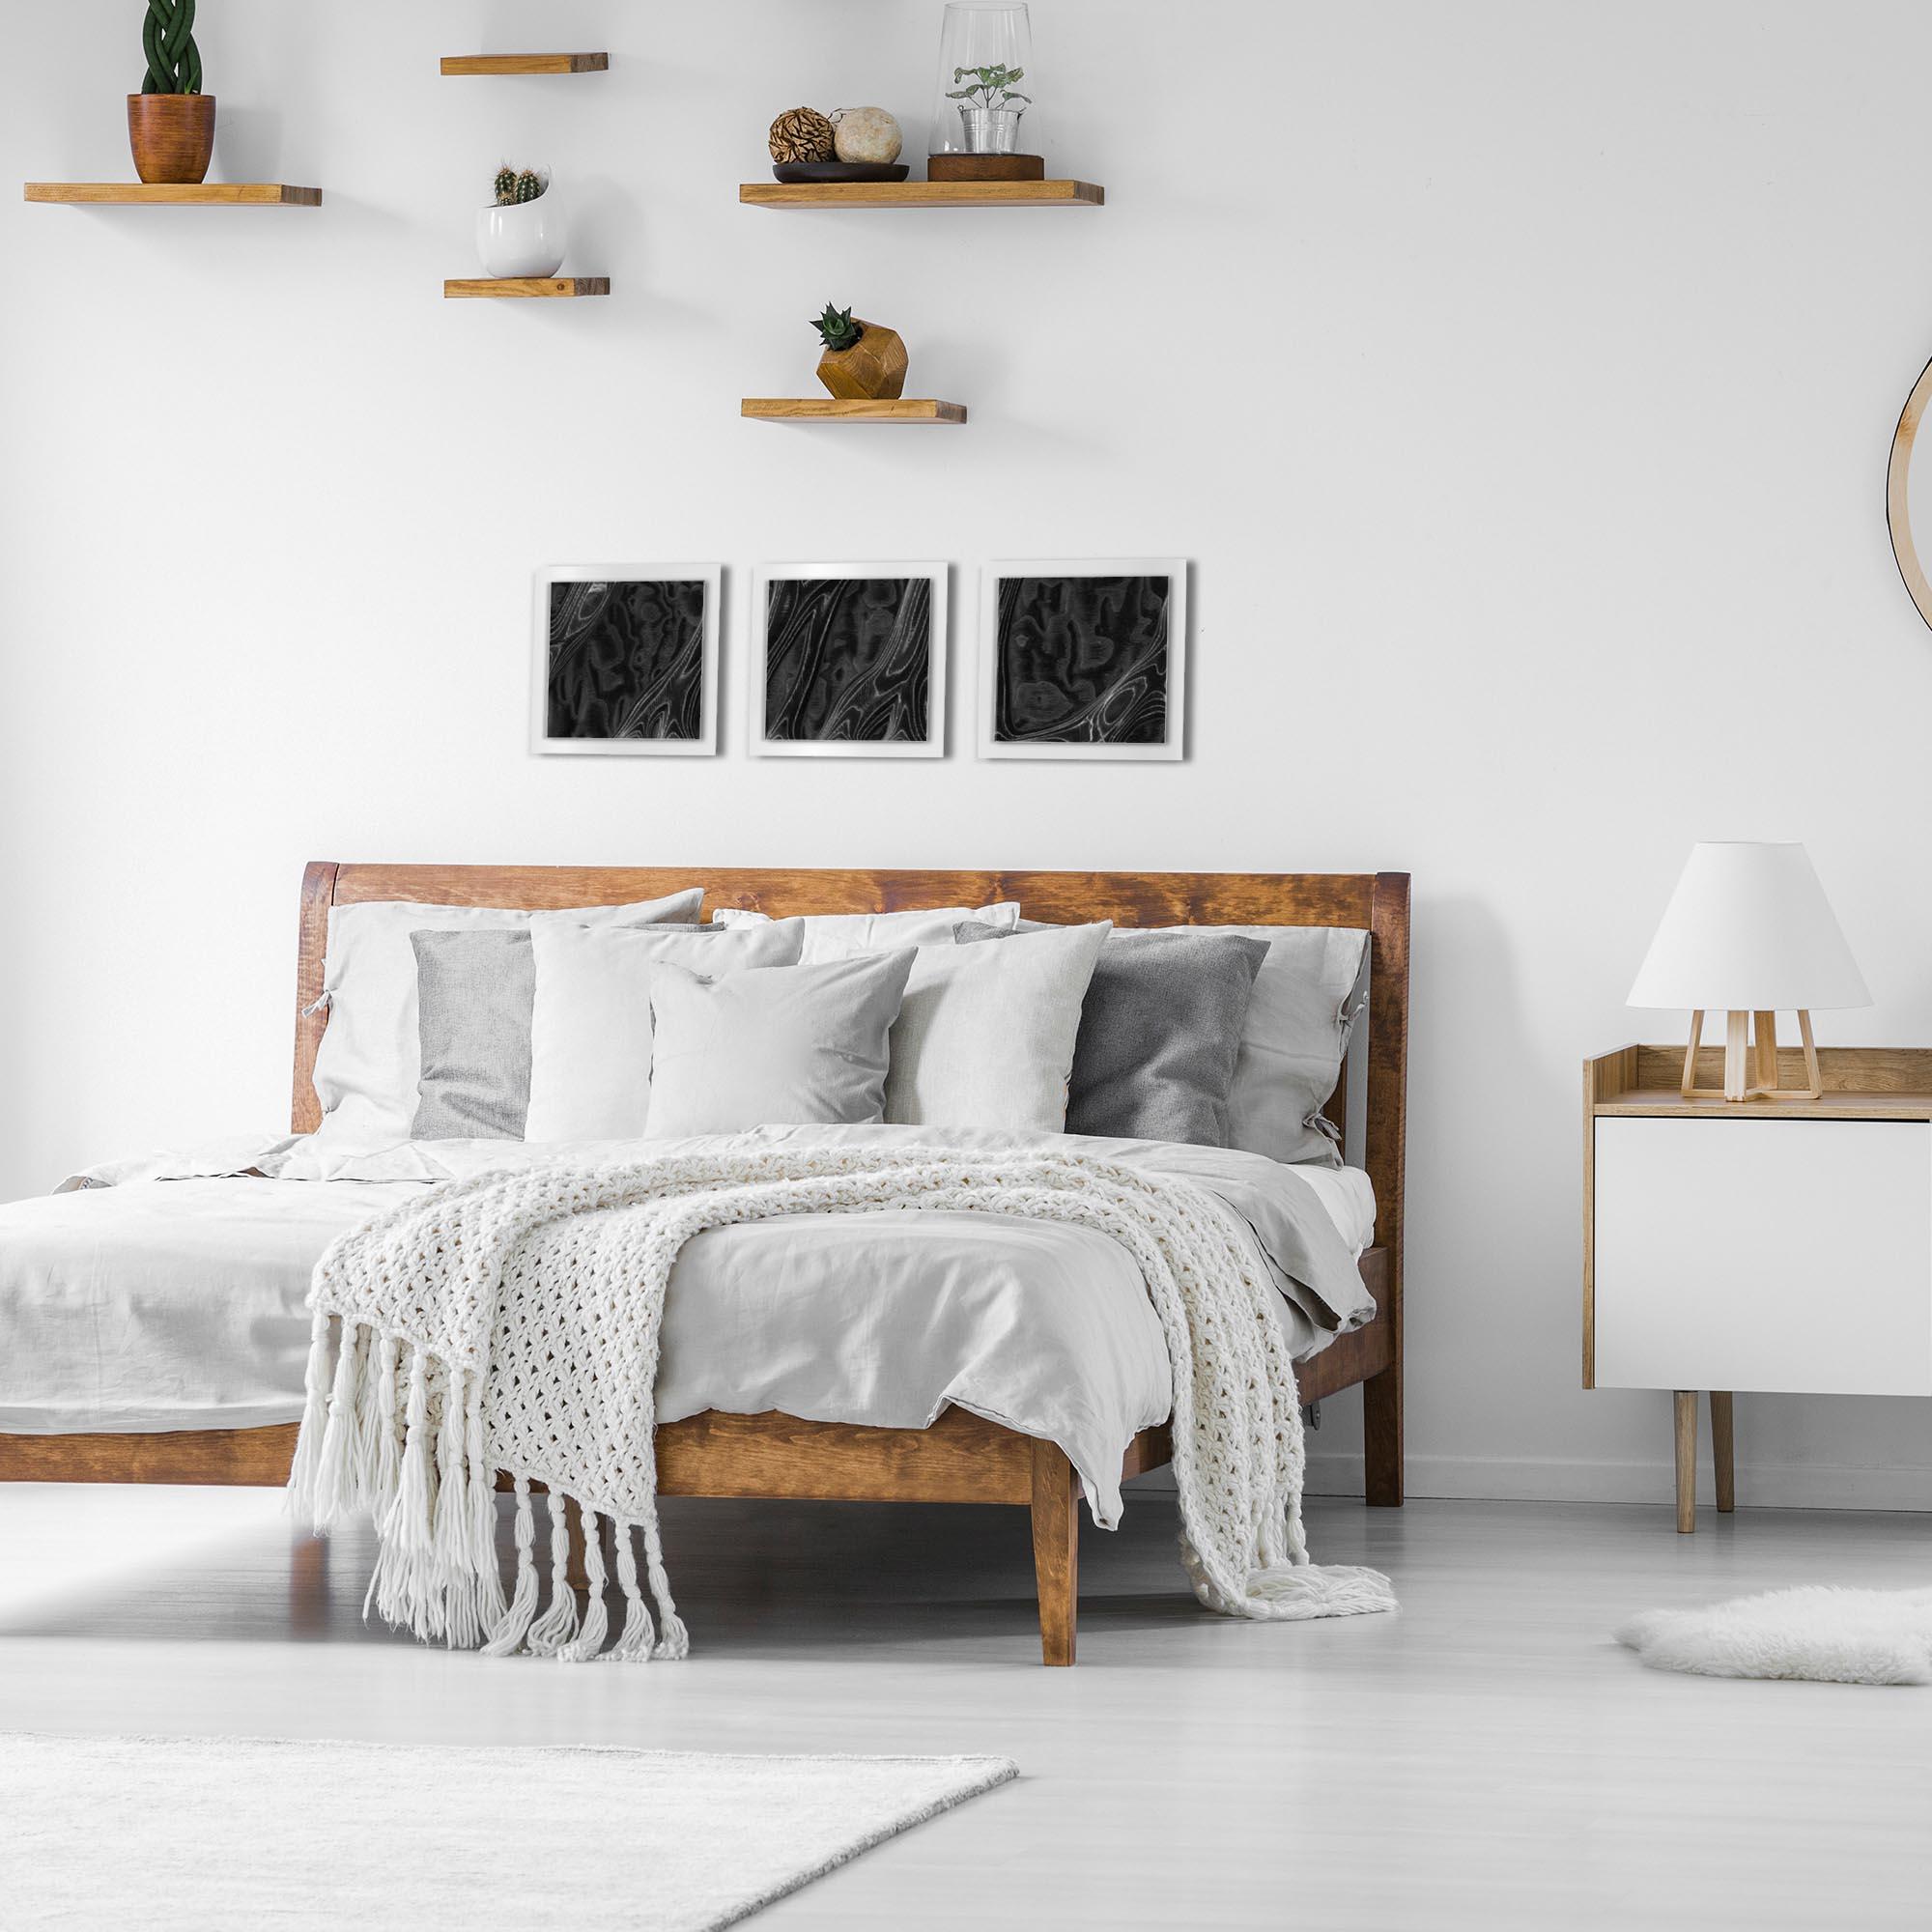 Ebony Burl Essence White by Jackson Wright Rustic Modern Style Wood Wall Art - Lifestyle View